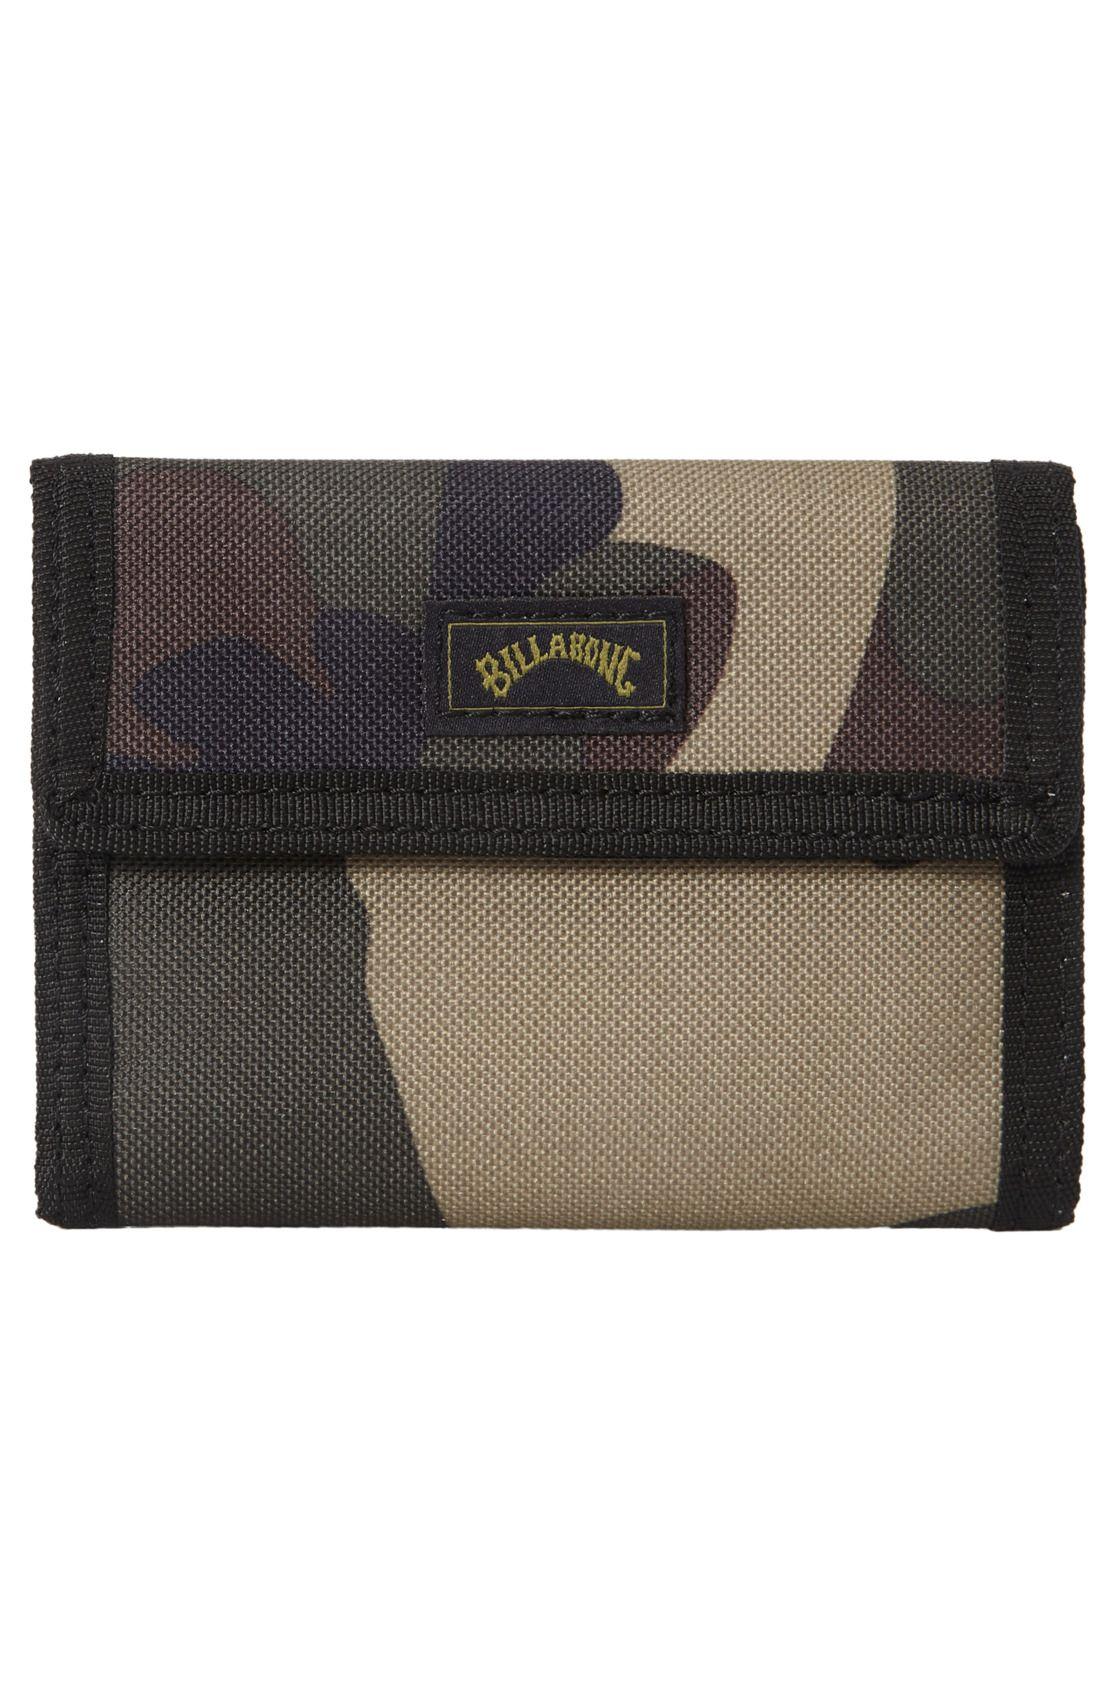 Billabong Wallet TRIBONG LITE Black Camo